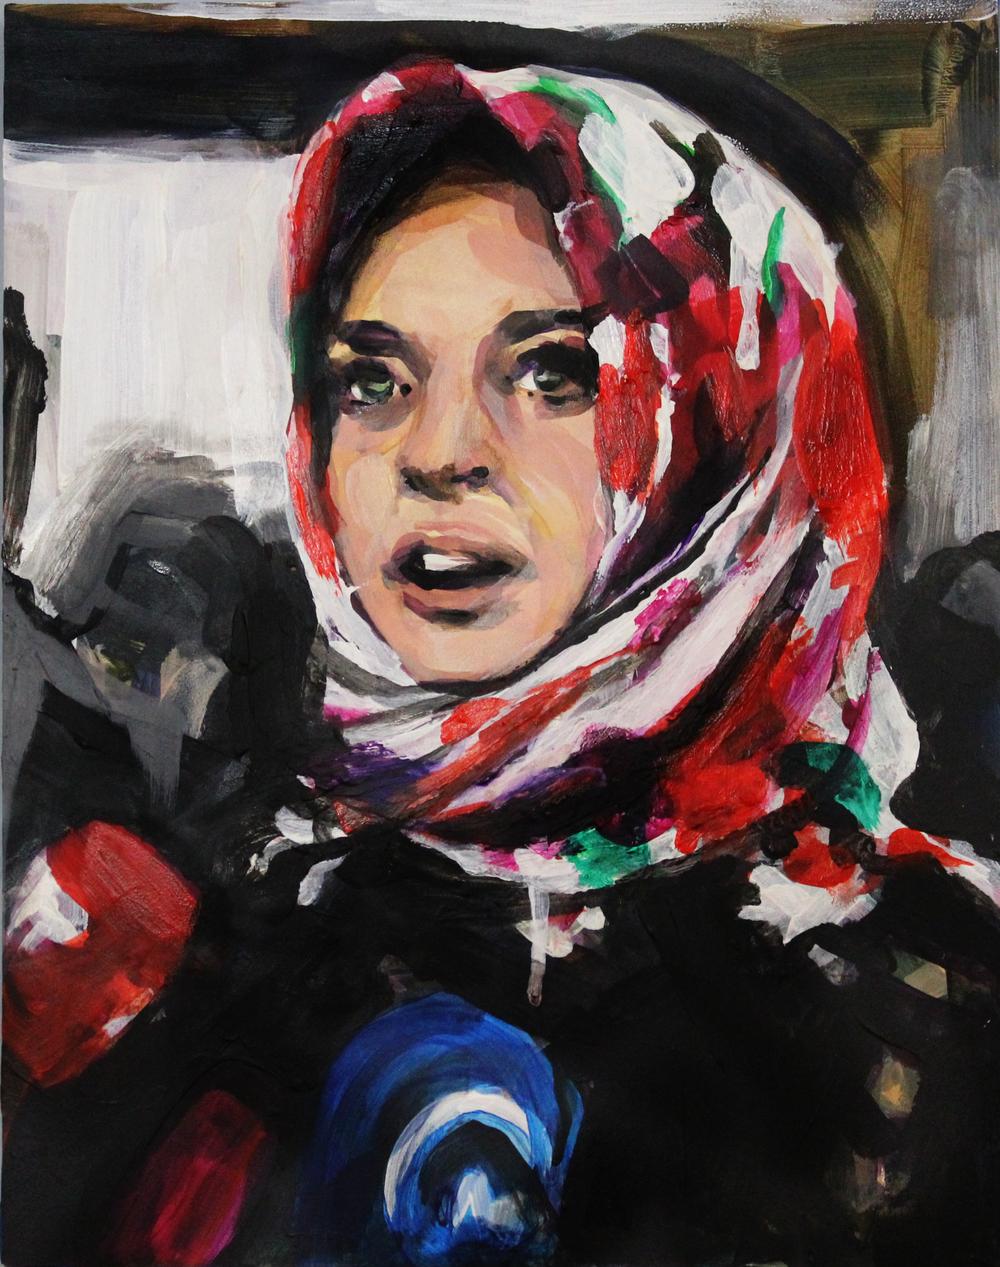 "Lindsay Lohan in a Floral Hijab 11"" x 14"" acrylic on panel"